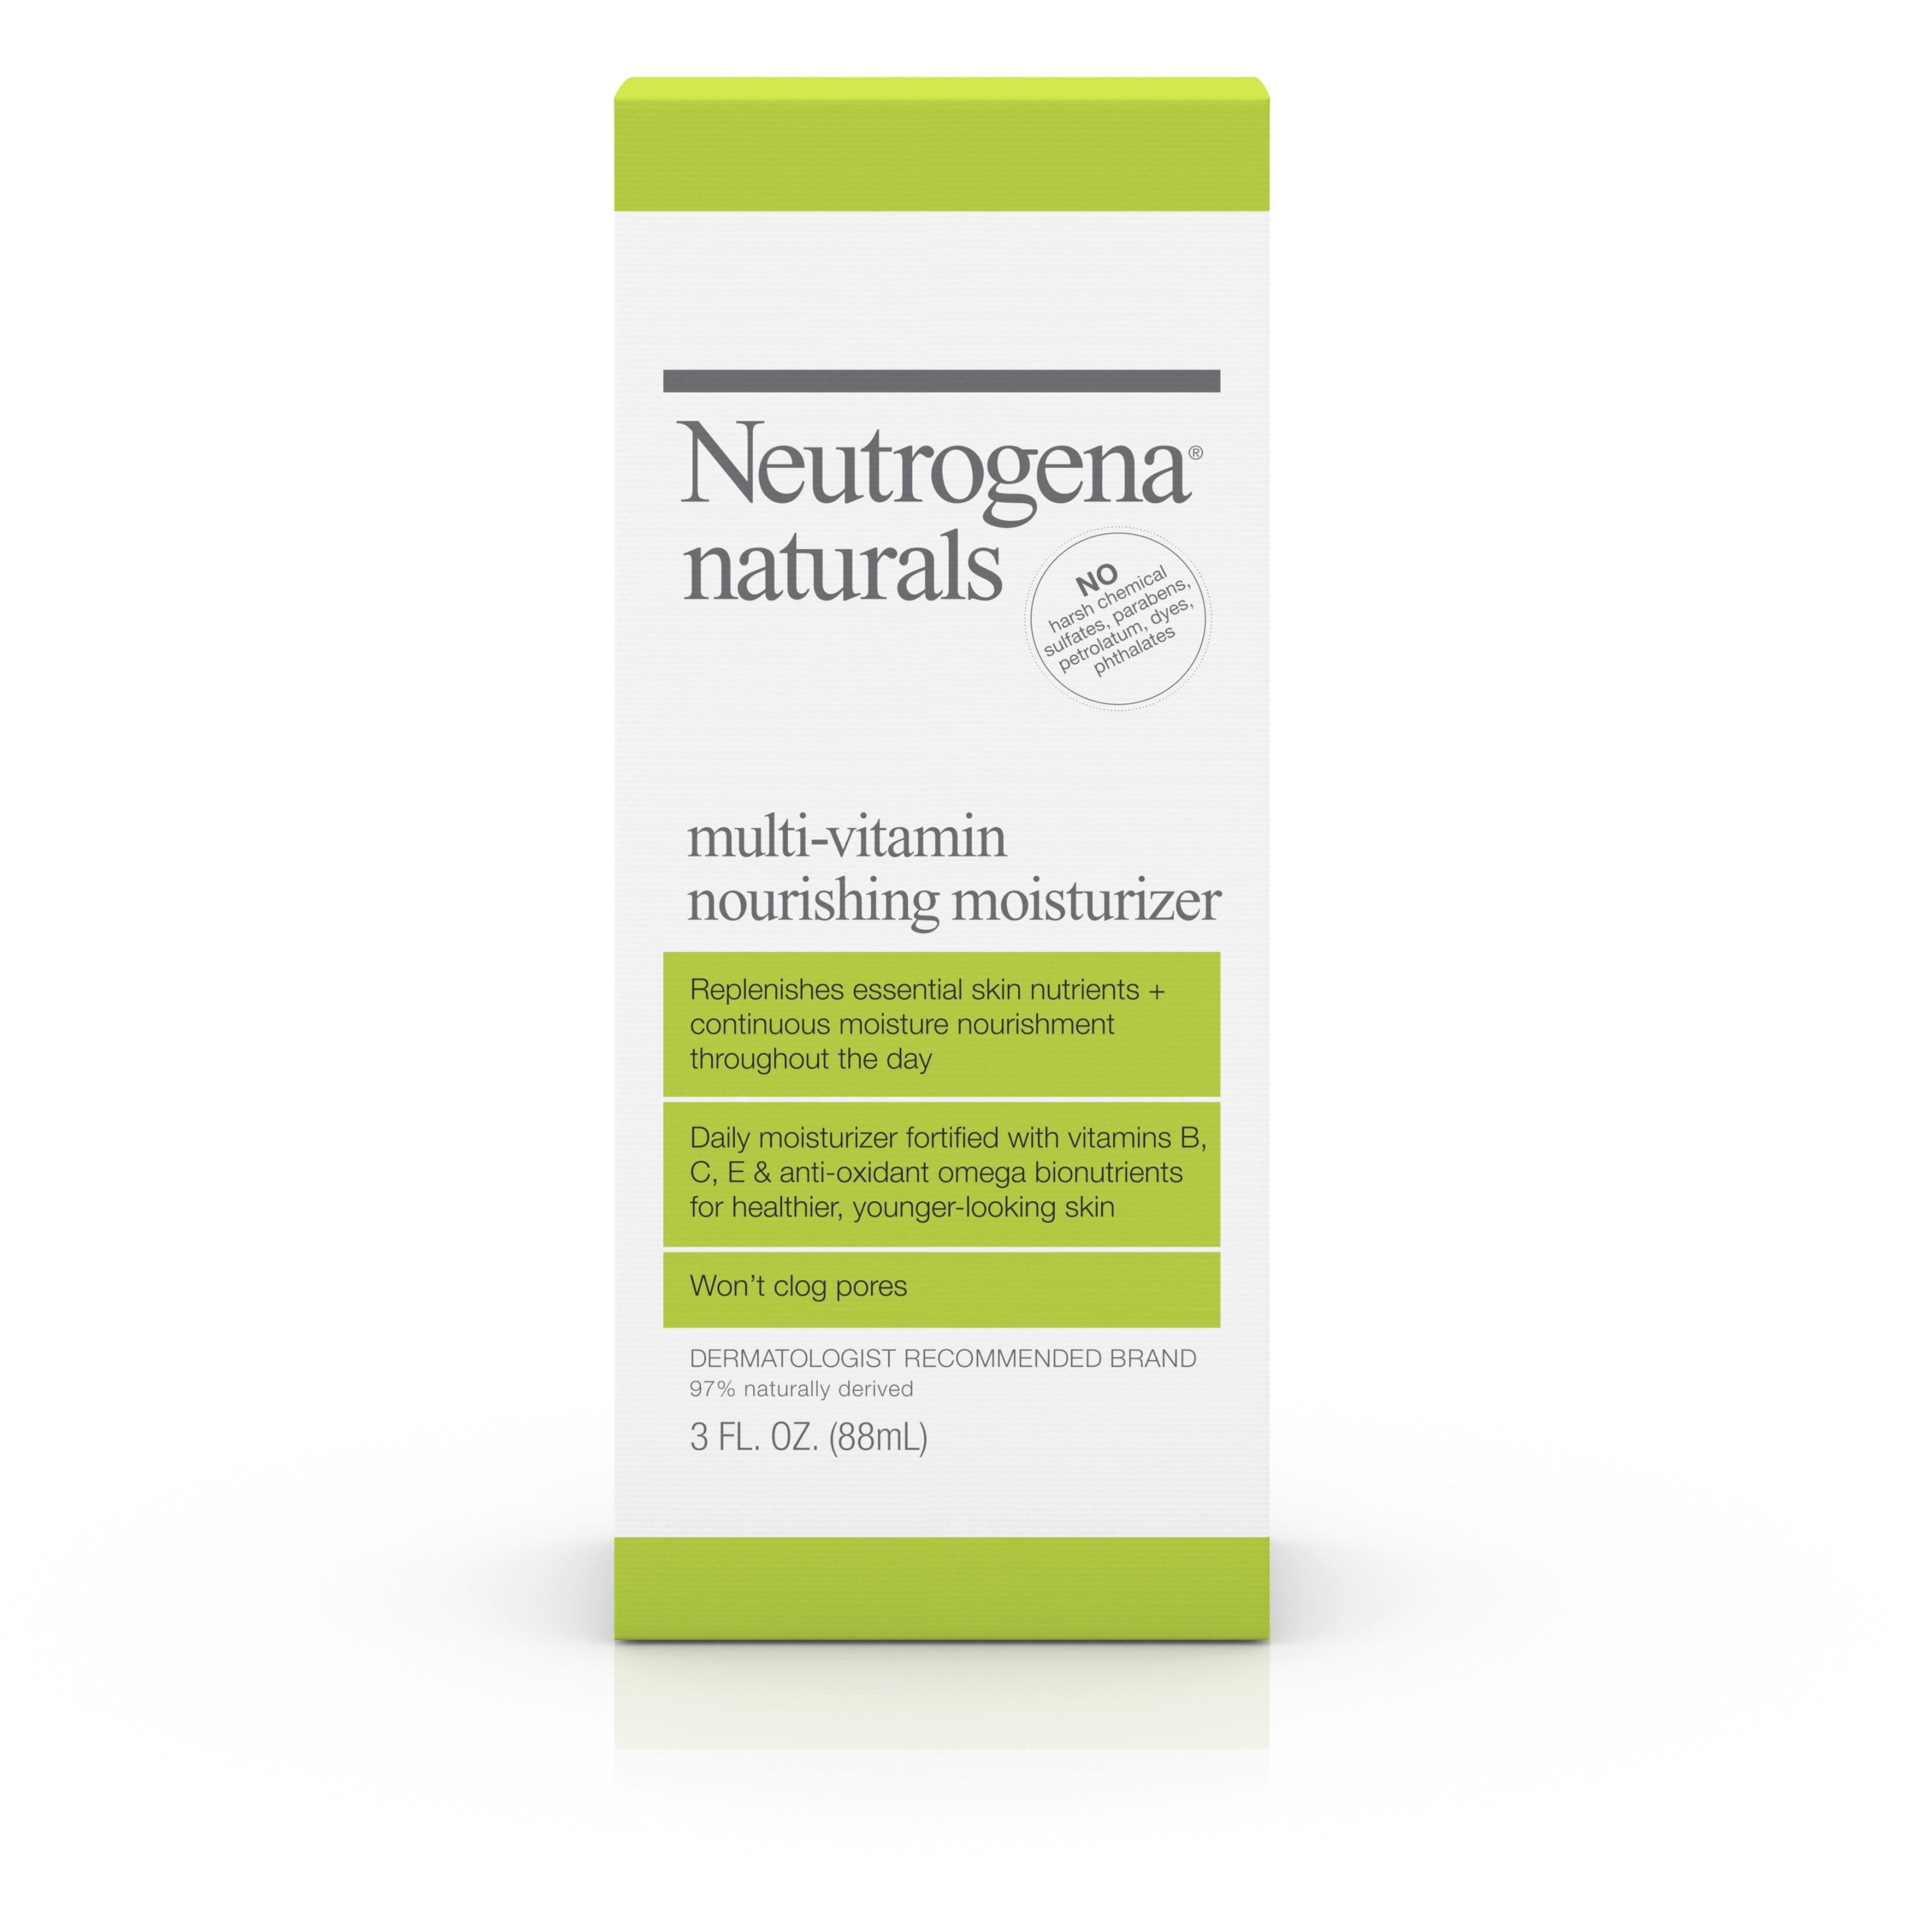 Neutrogena Naturals Multi-Vitamin Nourishing Face Moisturizer, 3 Fl. Oz. - Walmart.com